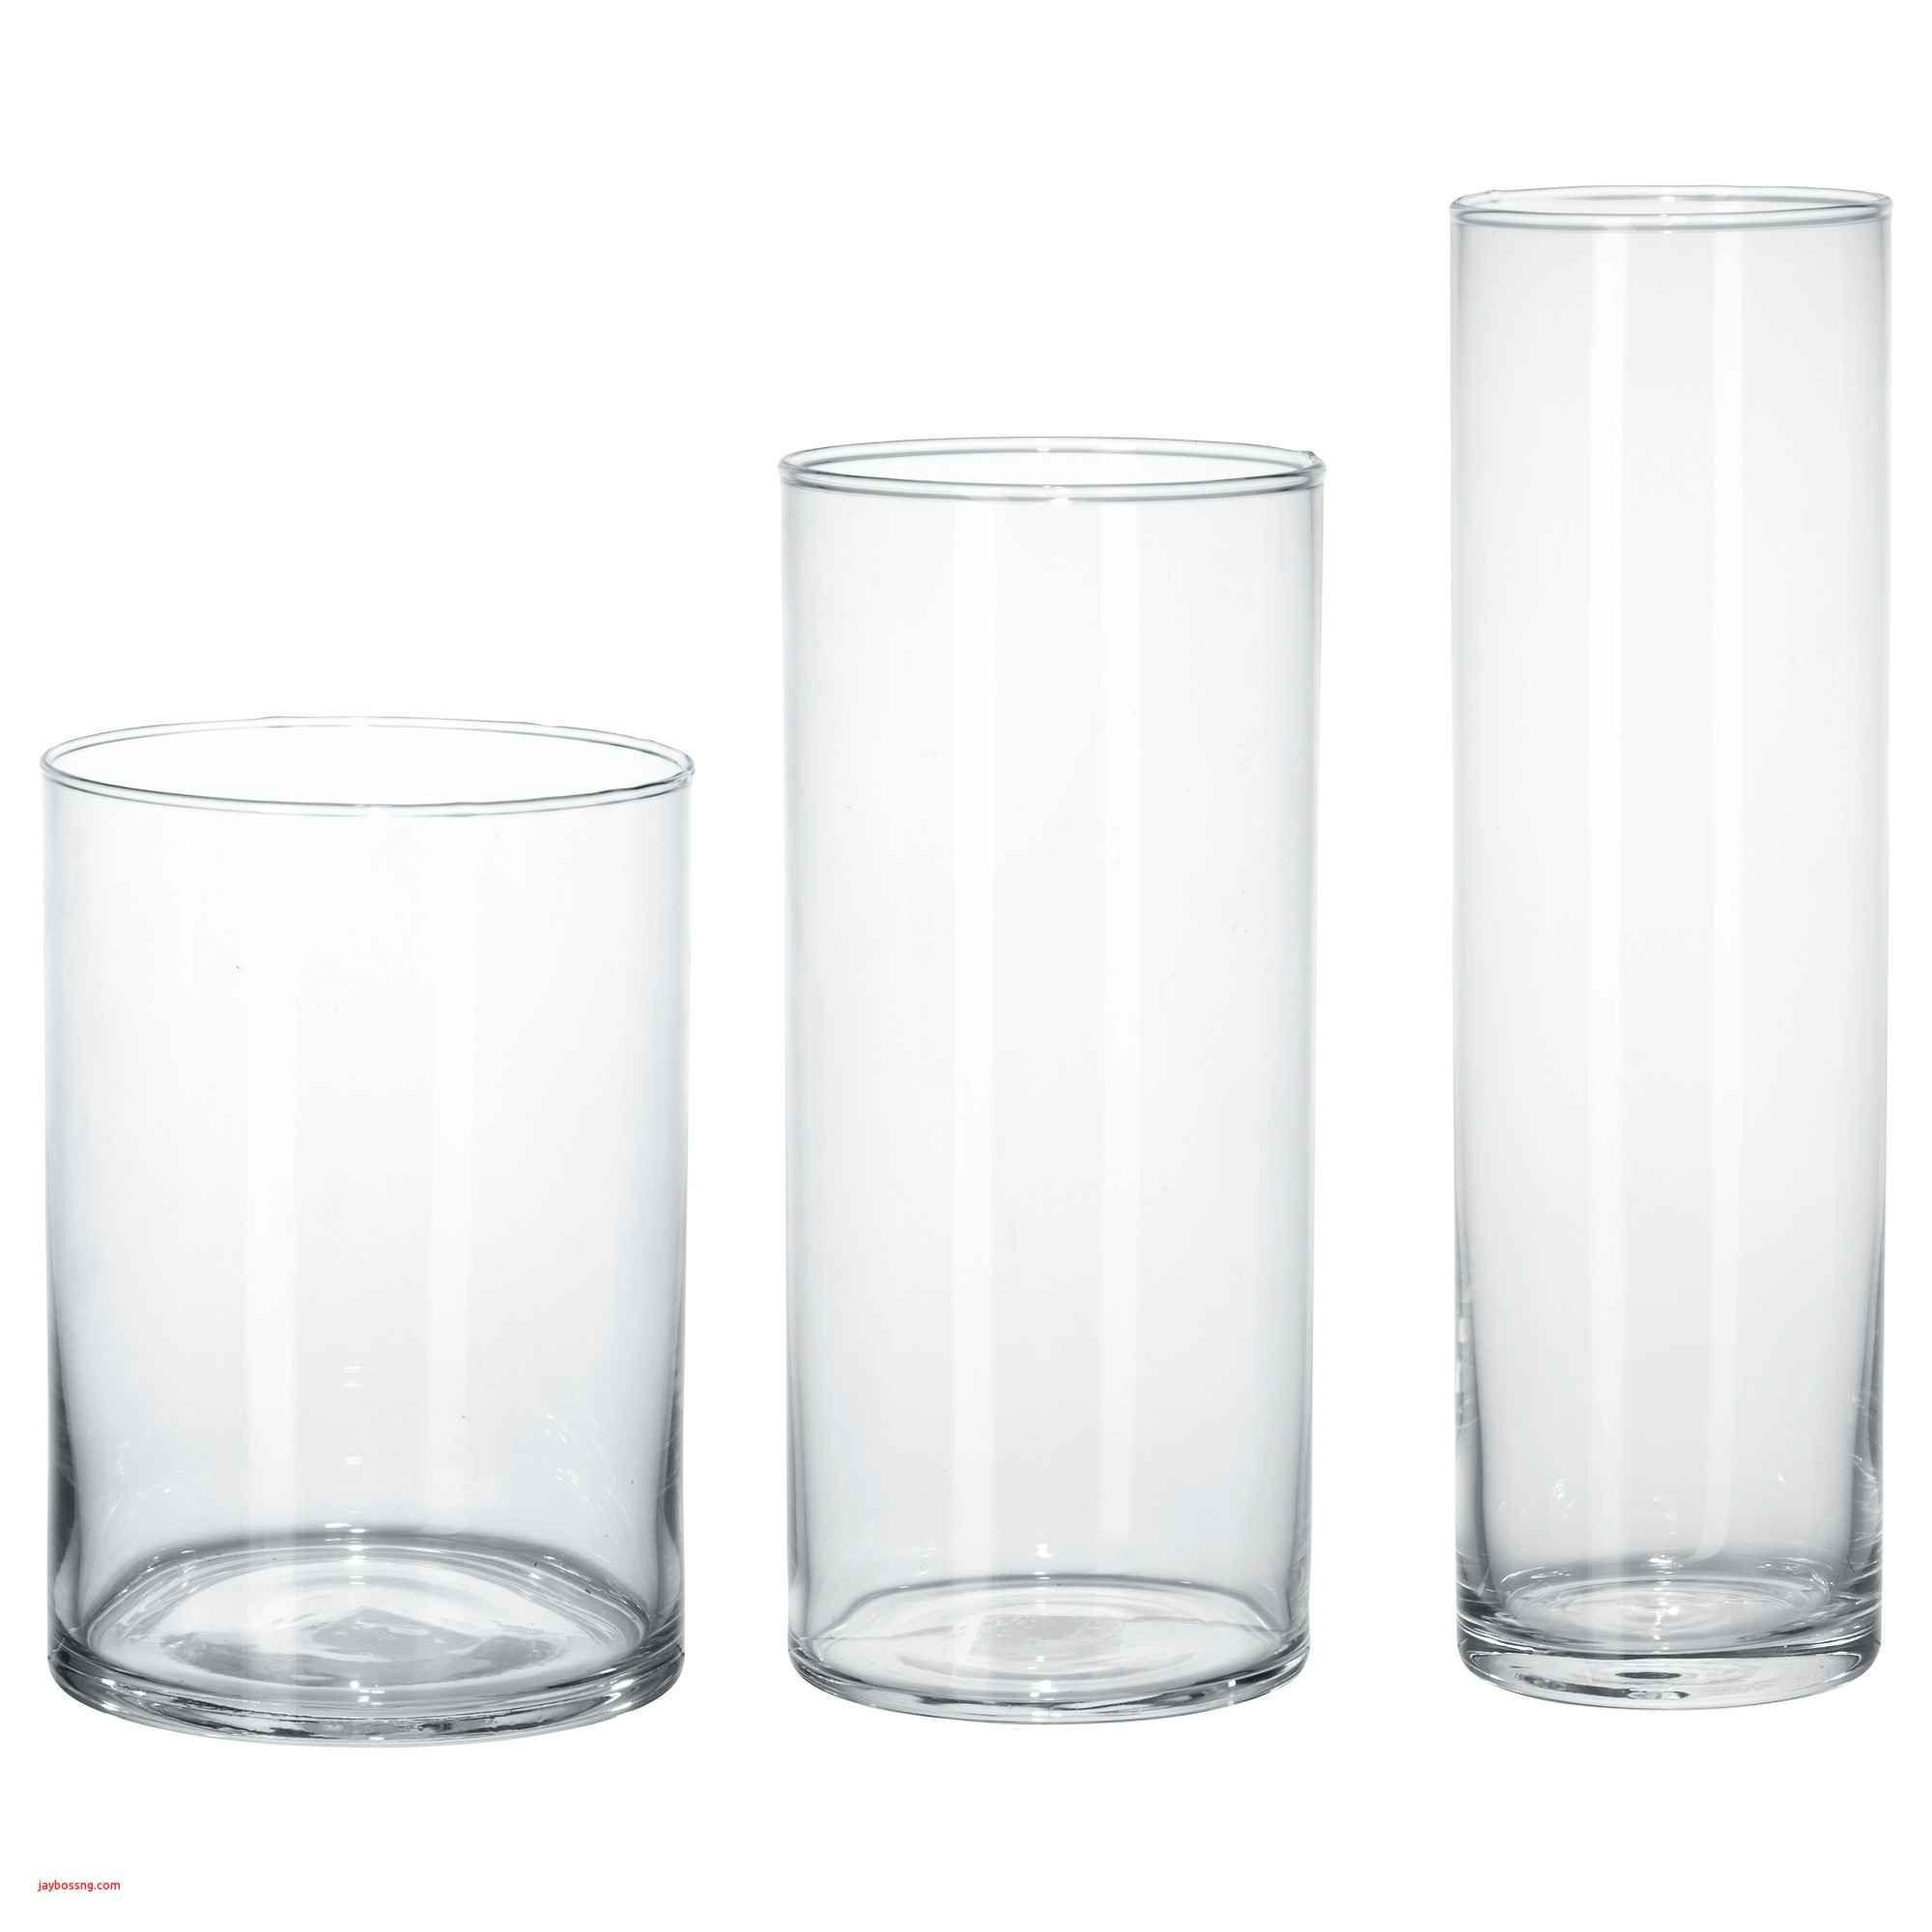 turquoise vase set of brown glass vase fresh ikea white table created pe s5h vases ikea for brown glass vase fresh ikea white table created pe s5h vases ikea vase i 0d bladet